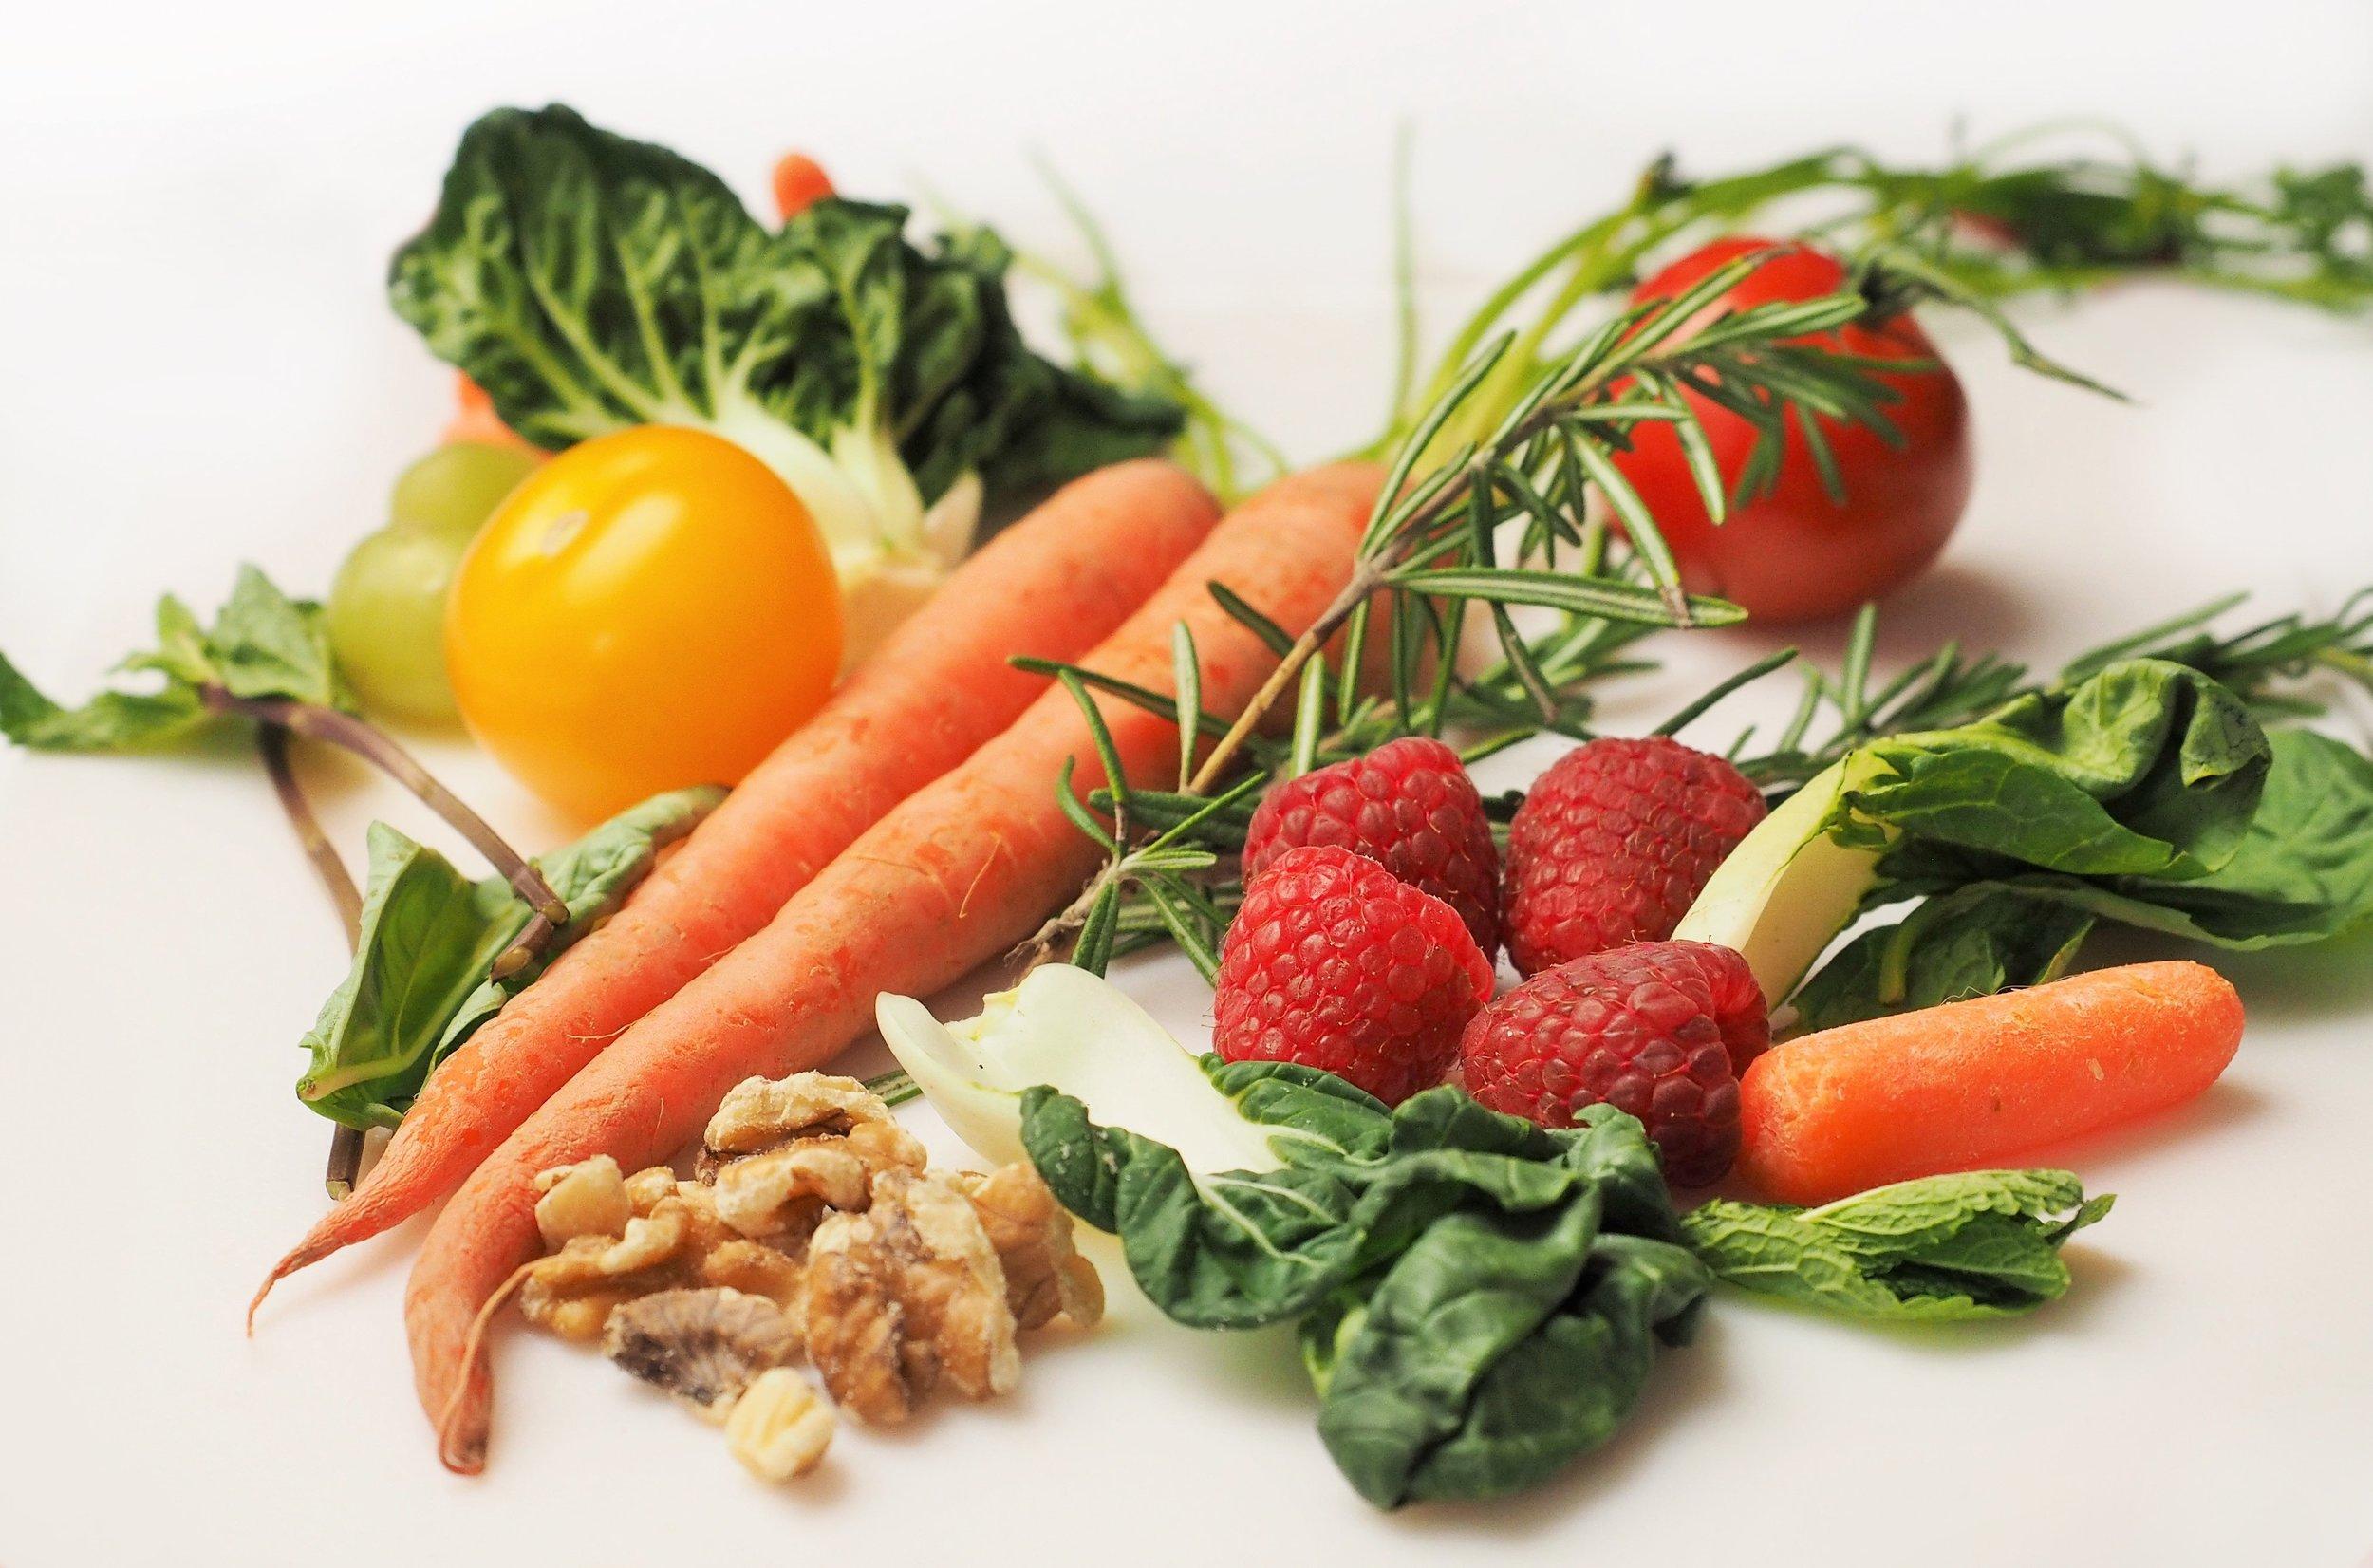 agriculture-antioxidant-carrot-33307.jpg